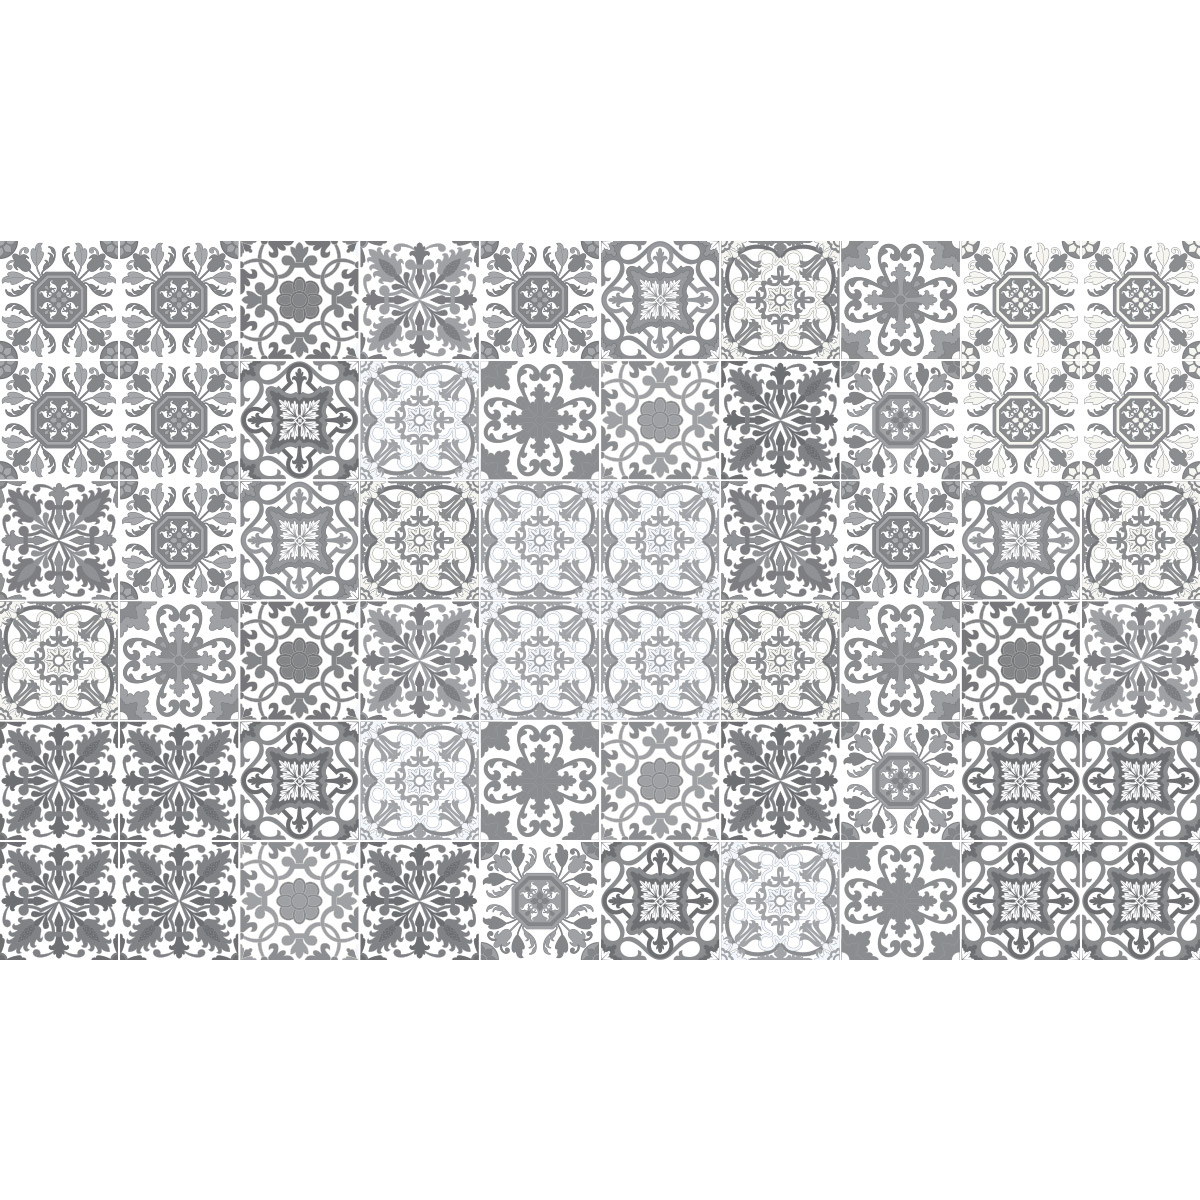 60 stickers carrelages azulejos vintage nuance de gris. Black Bedroom Furniture Sets. Home Design Ideas